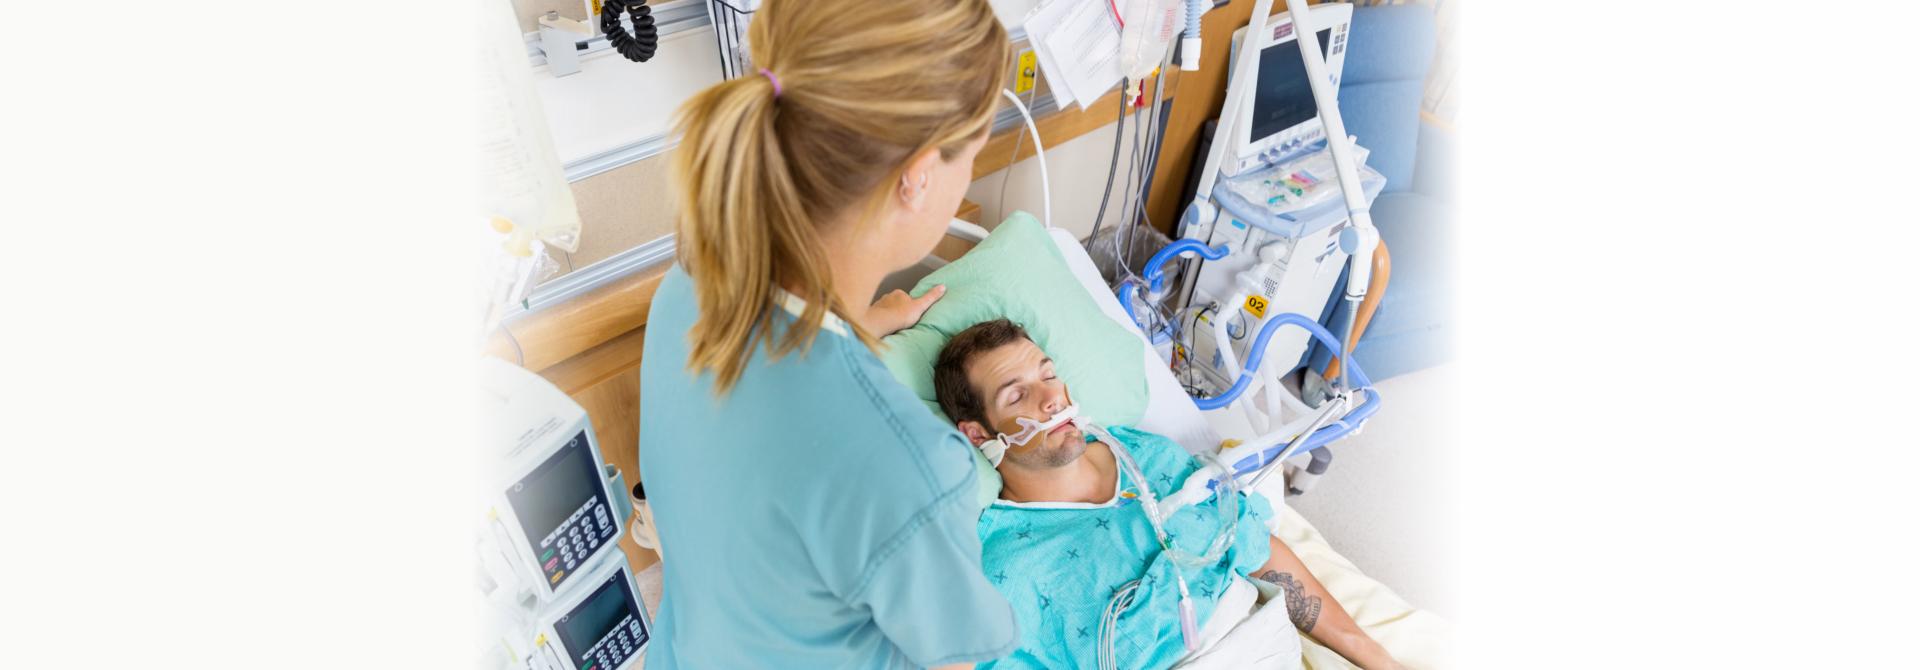 nurse assisting customer patient